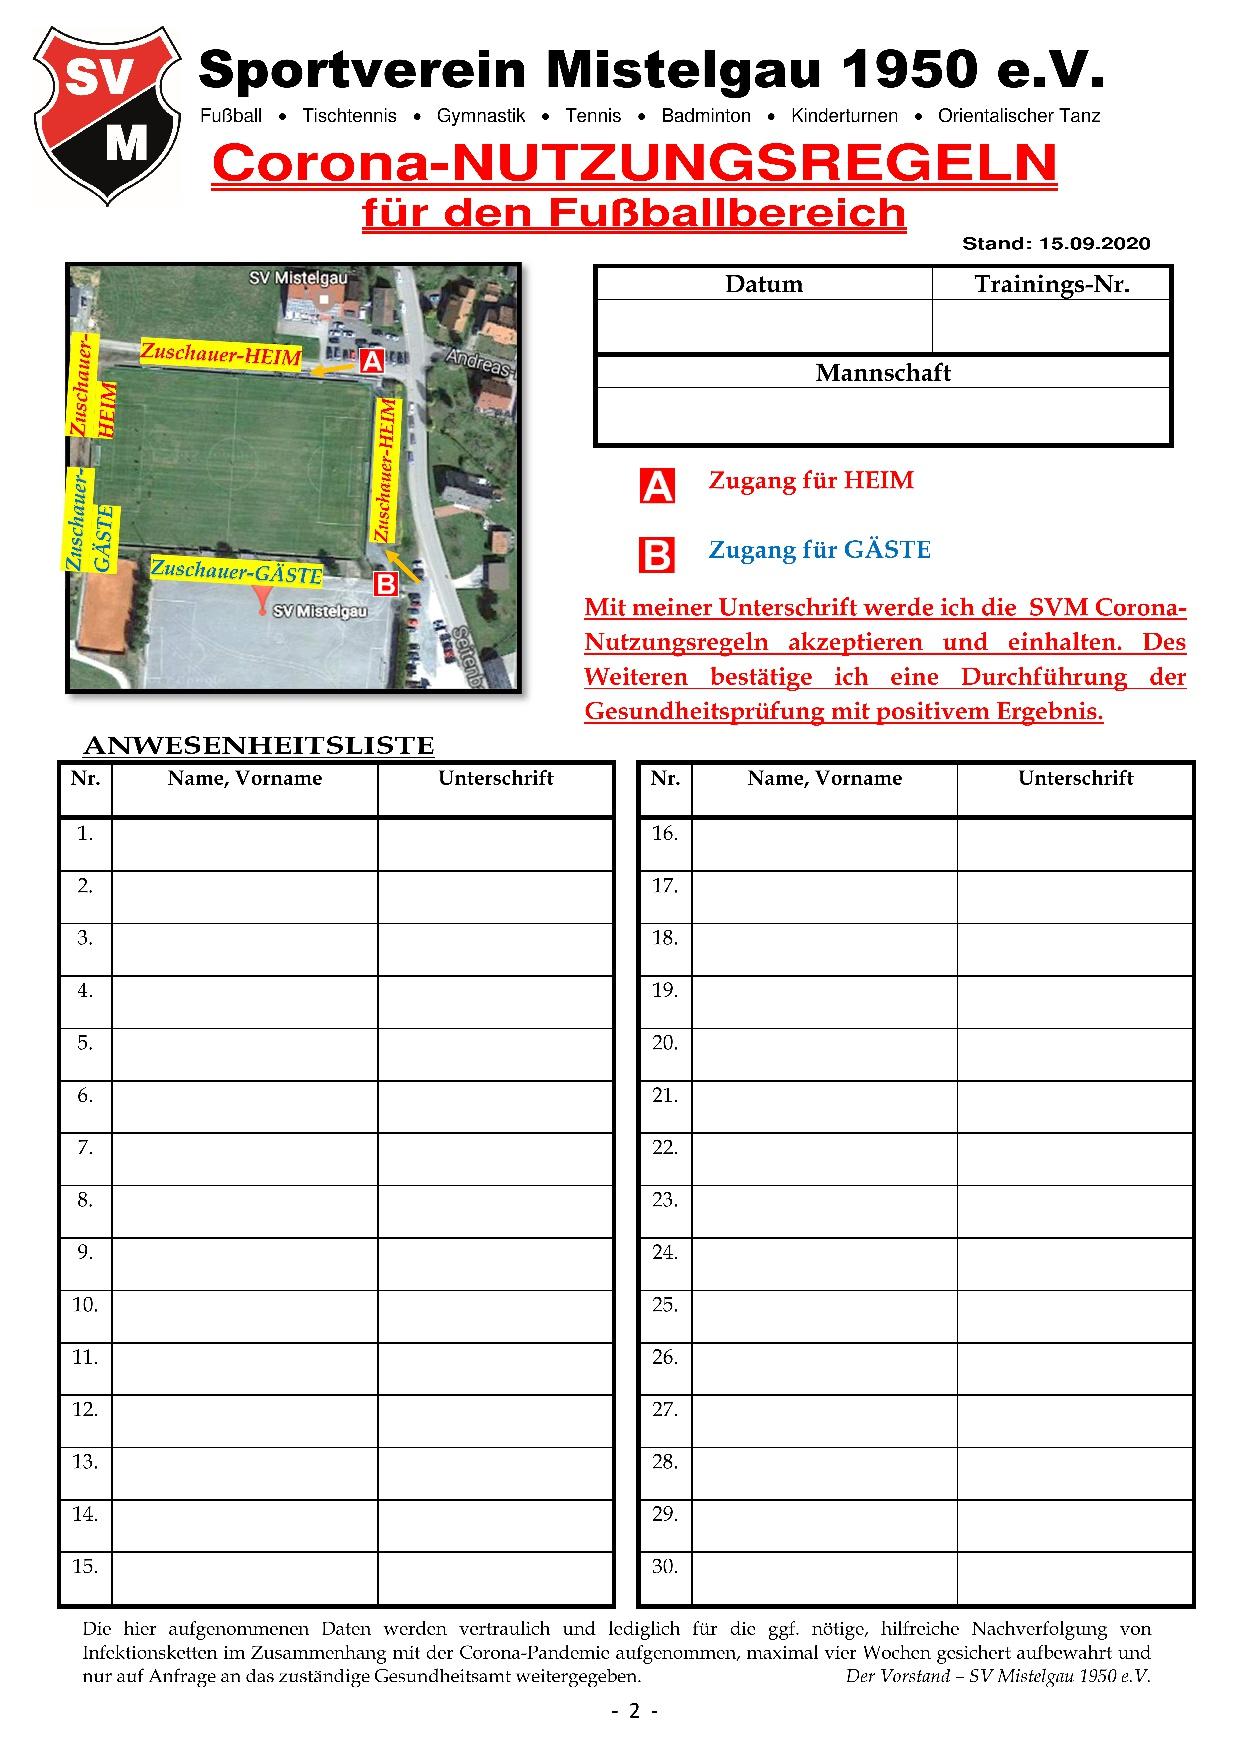 Covid19_Trainingsregeln_20200915.pdf